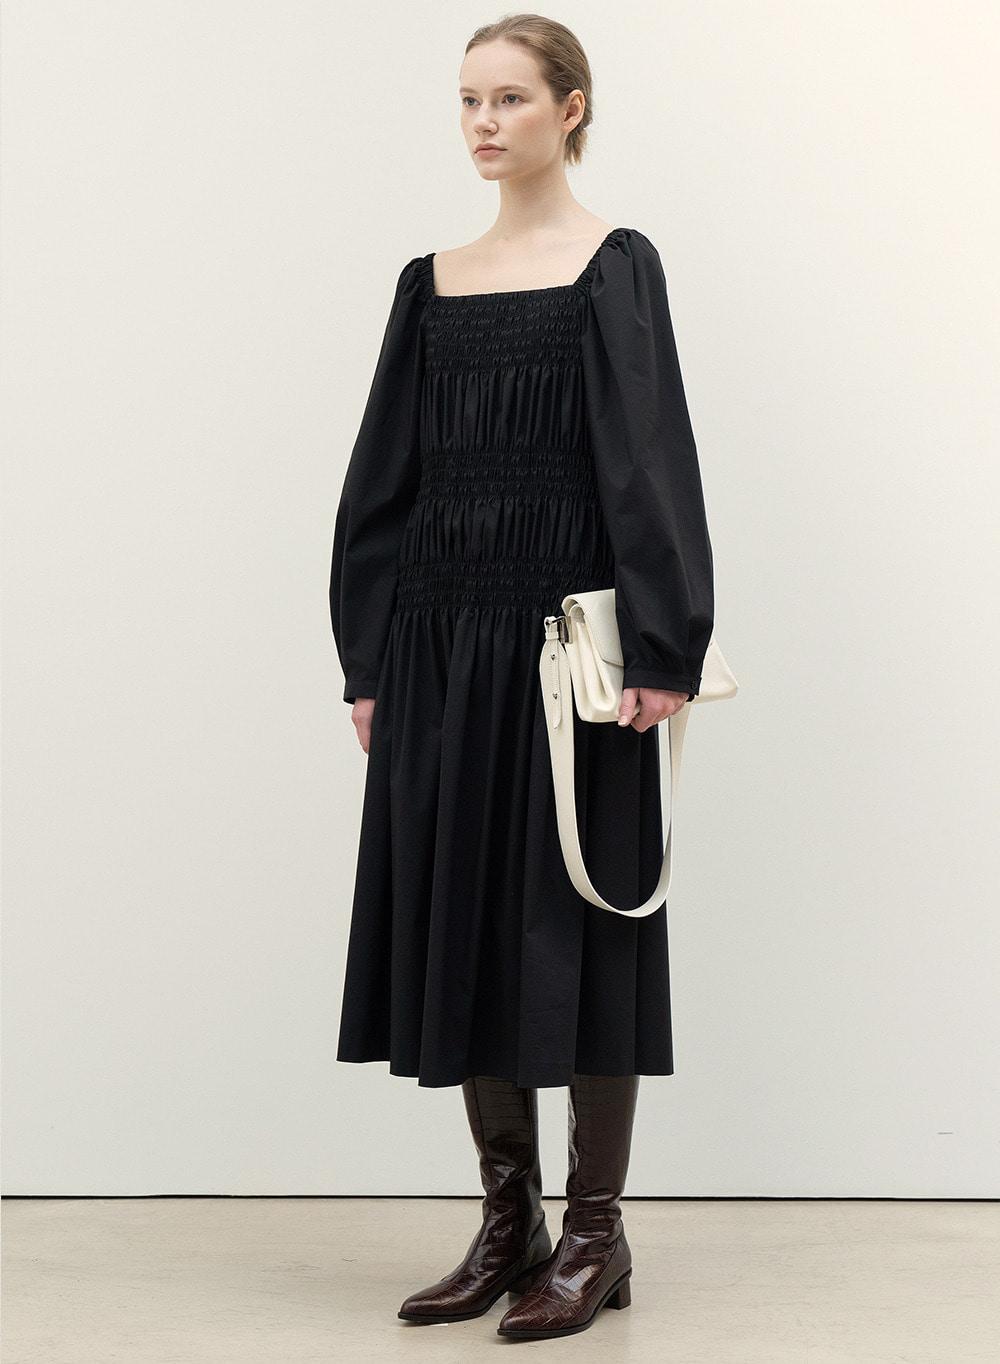 FW20 Smocked Dress Black